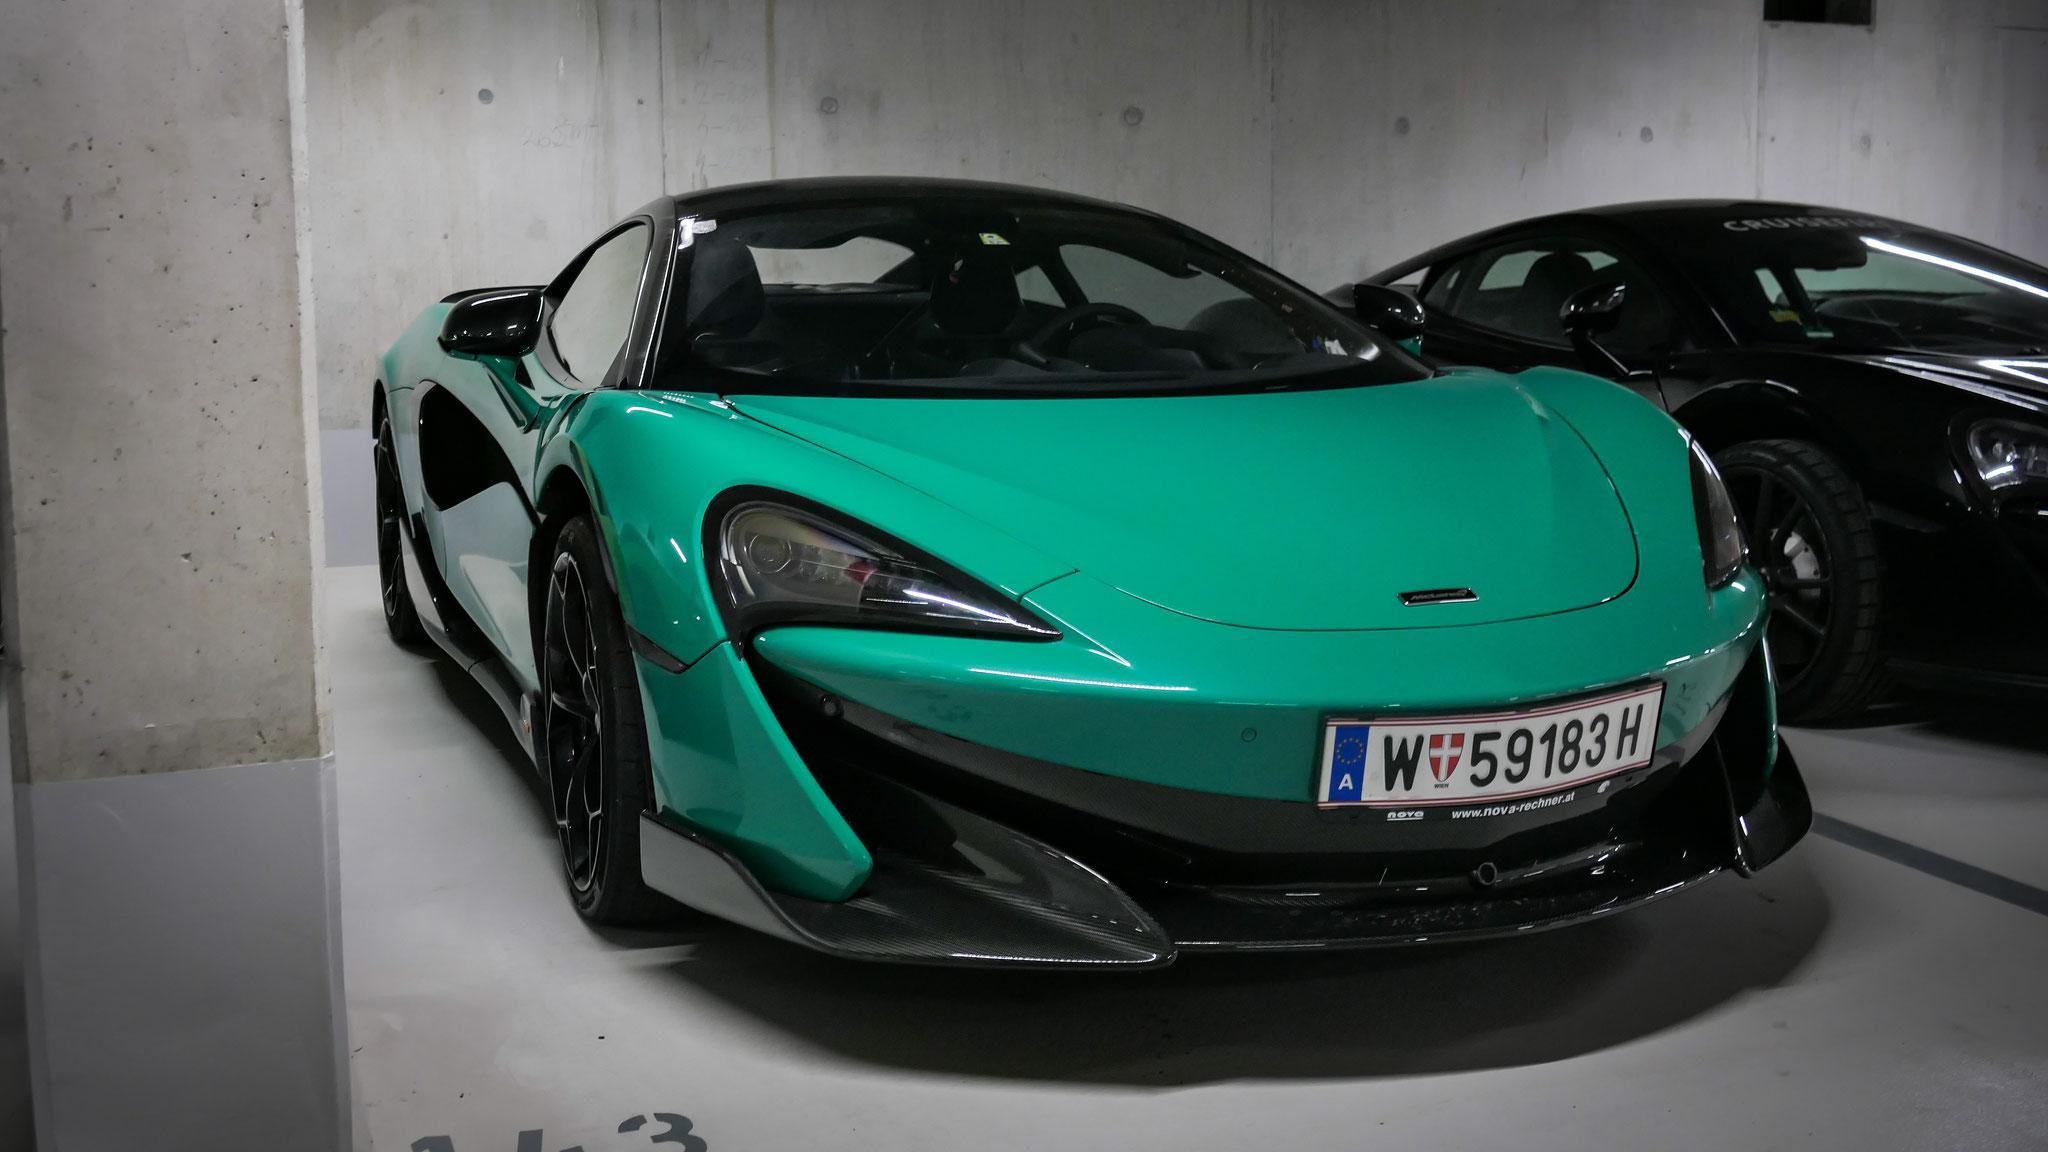 McLaren 600LT - W-59183-H (AUT)